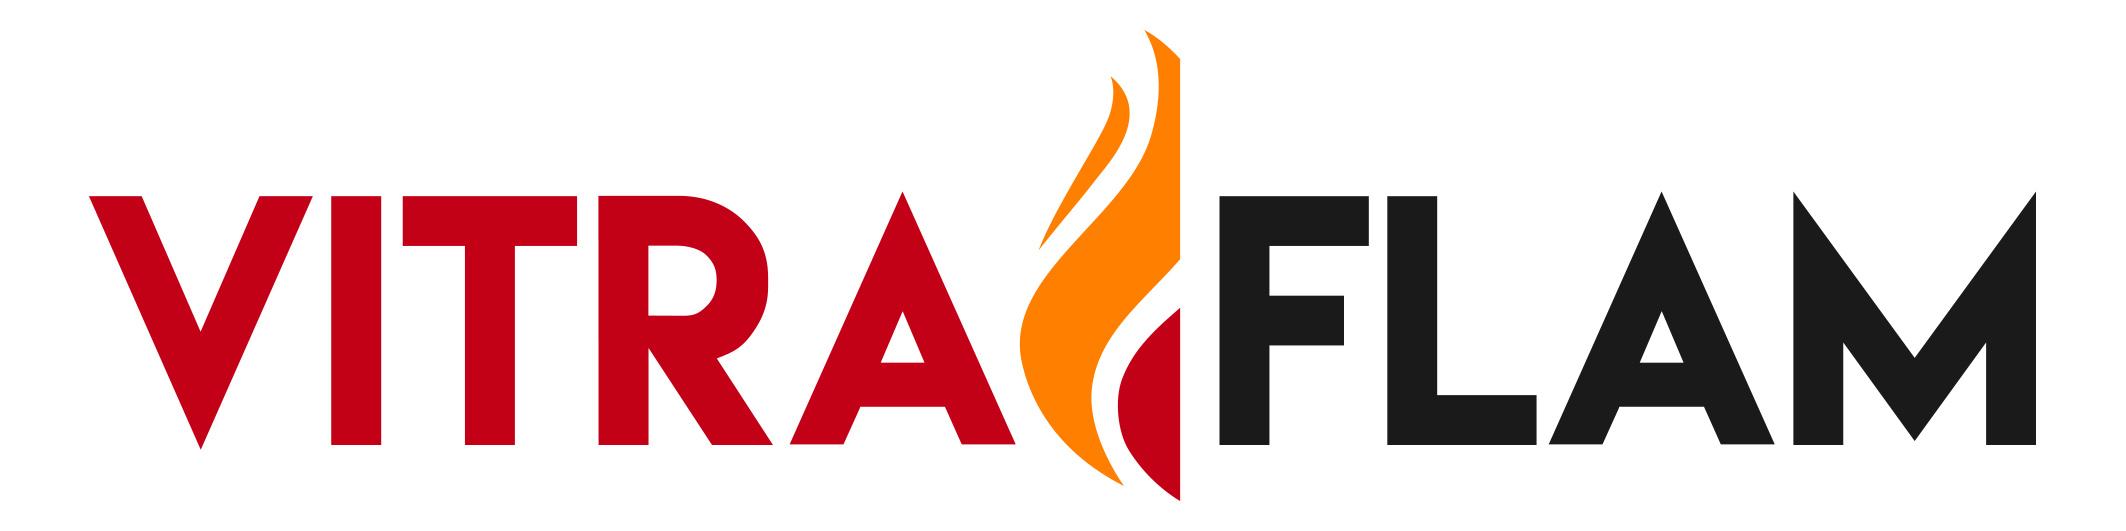 Vitraflam - vitrage coupe-feu et pare-flamme